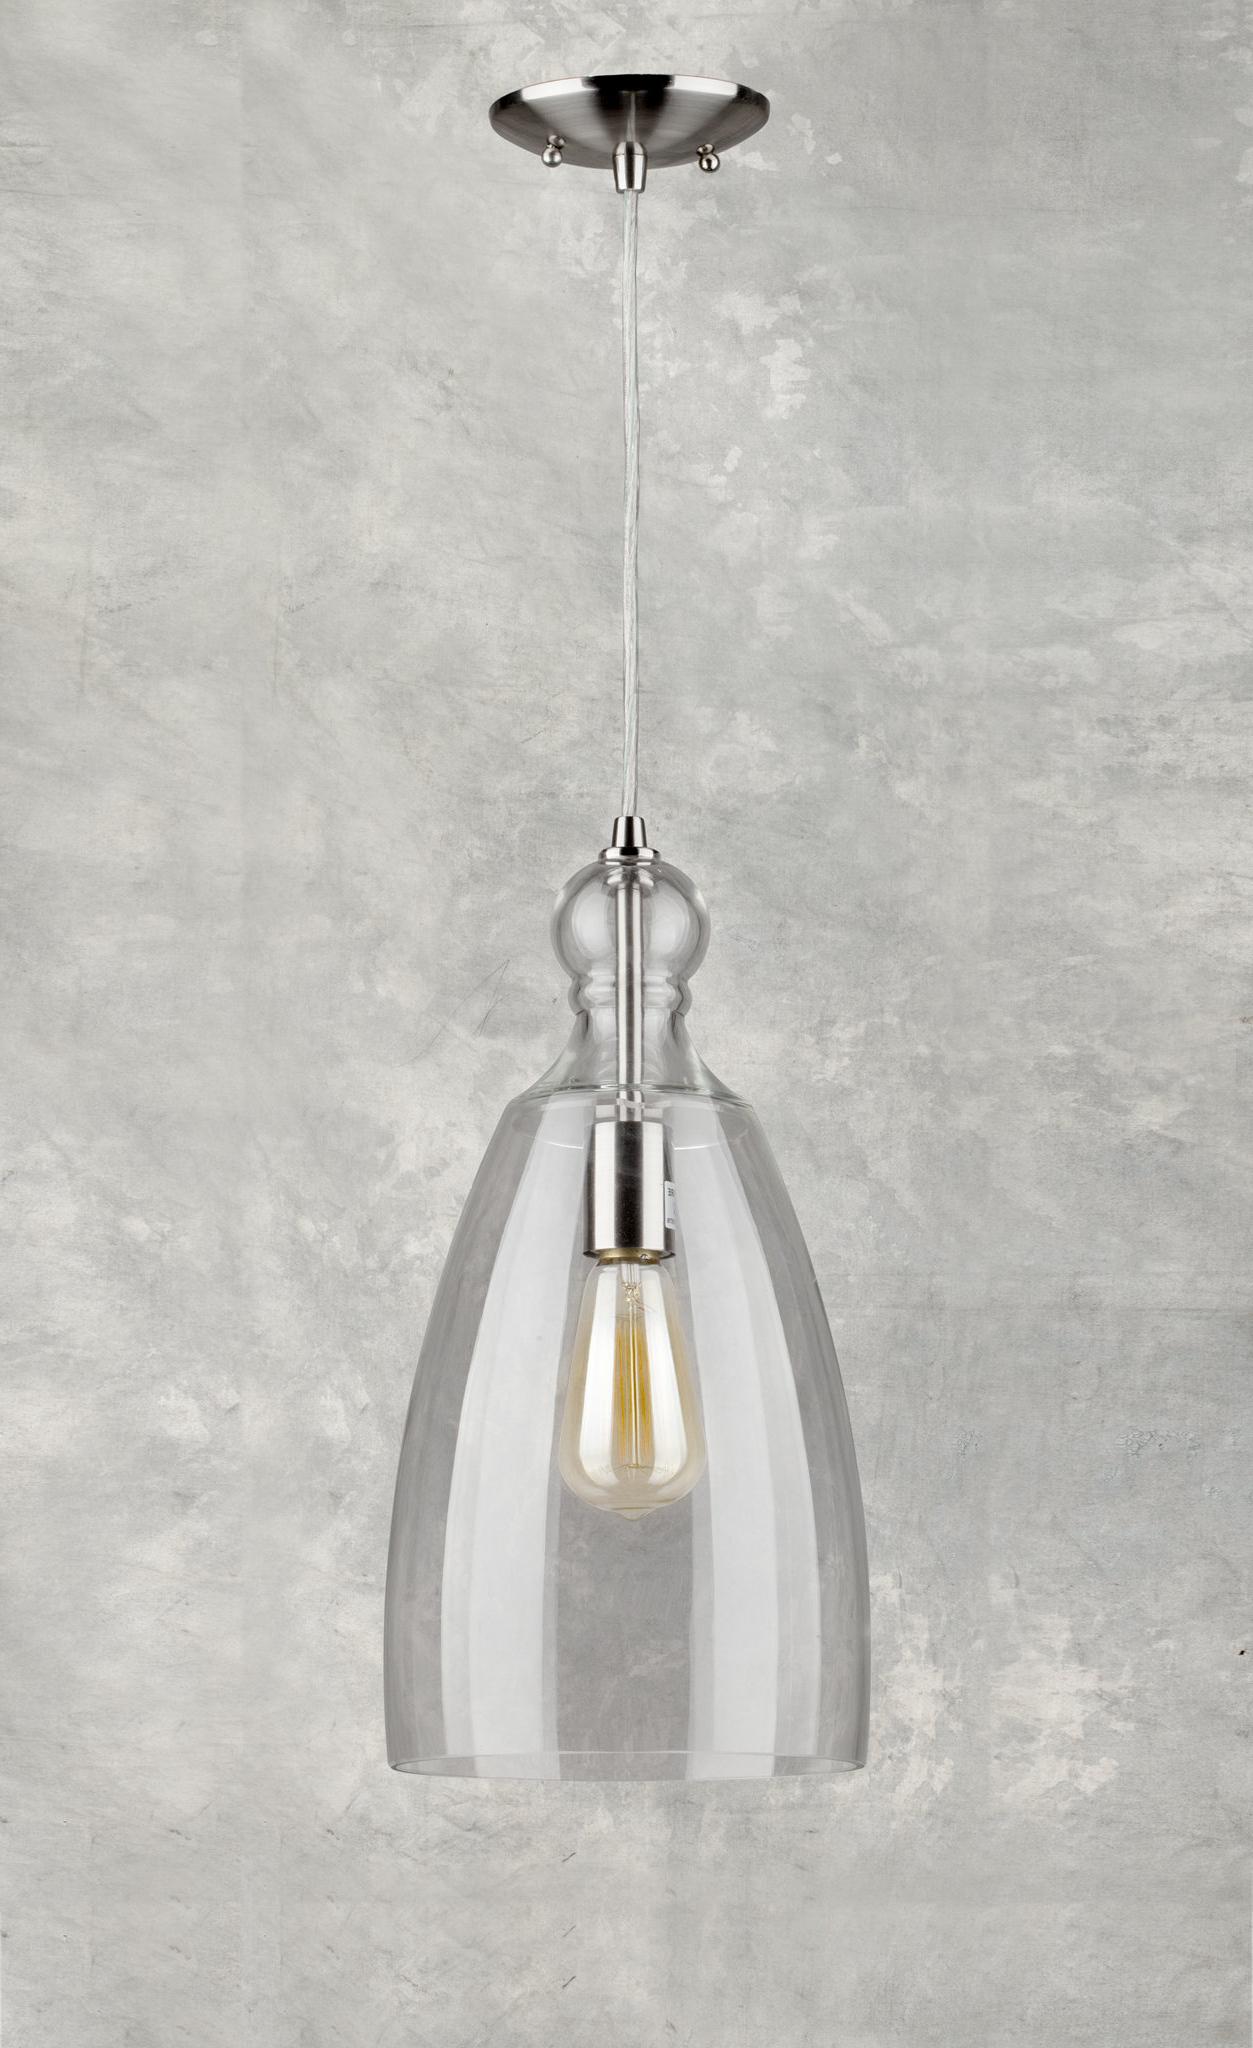 Goldie 1 Light Single Bell Pendants Intended For 2019 Du Bois Cord Hung 1 Light Bell Pendant (View 23 of 25)